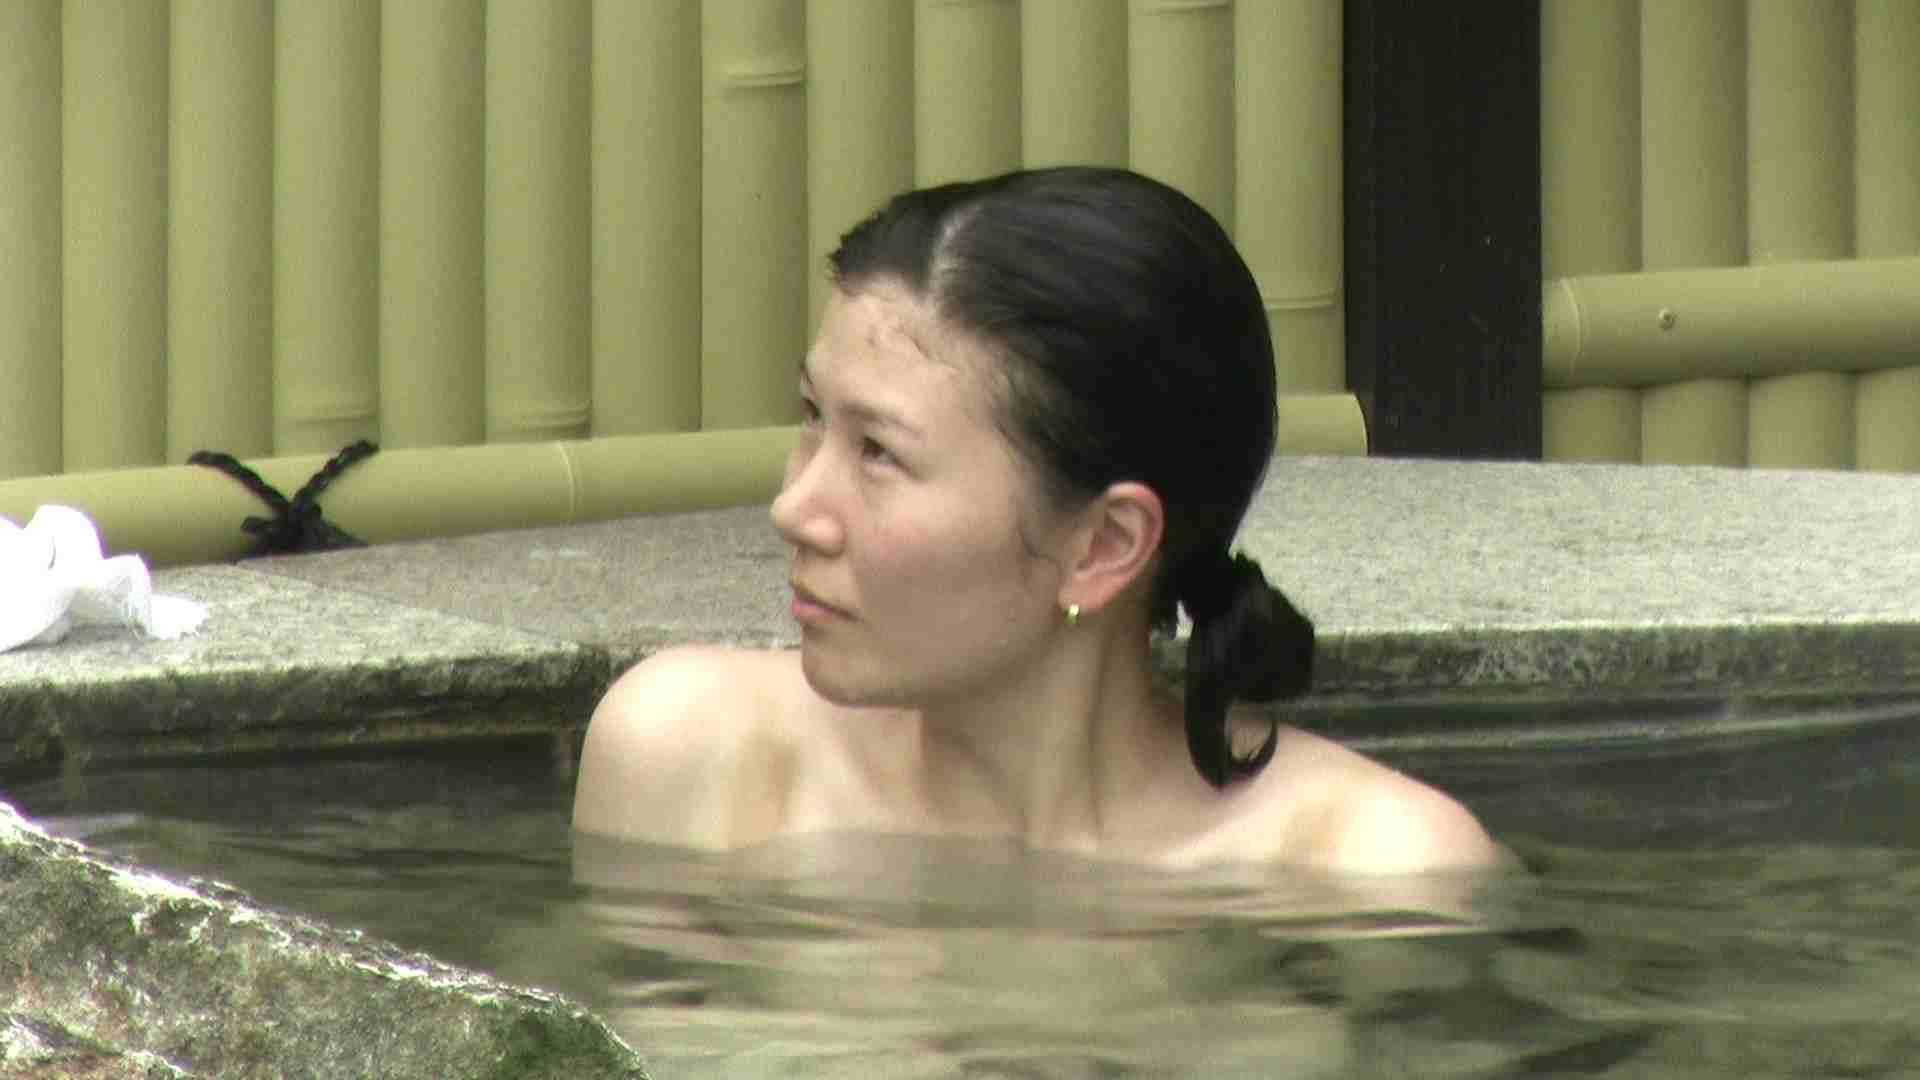 Aquaな露天風呂Vol.187 盗撮  63連発 22